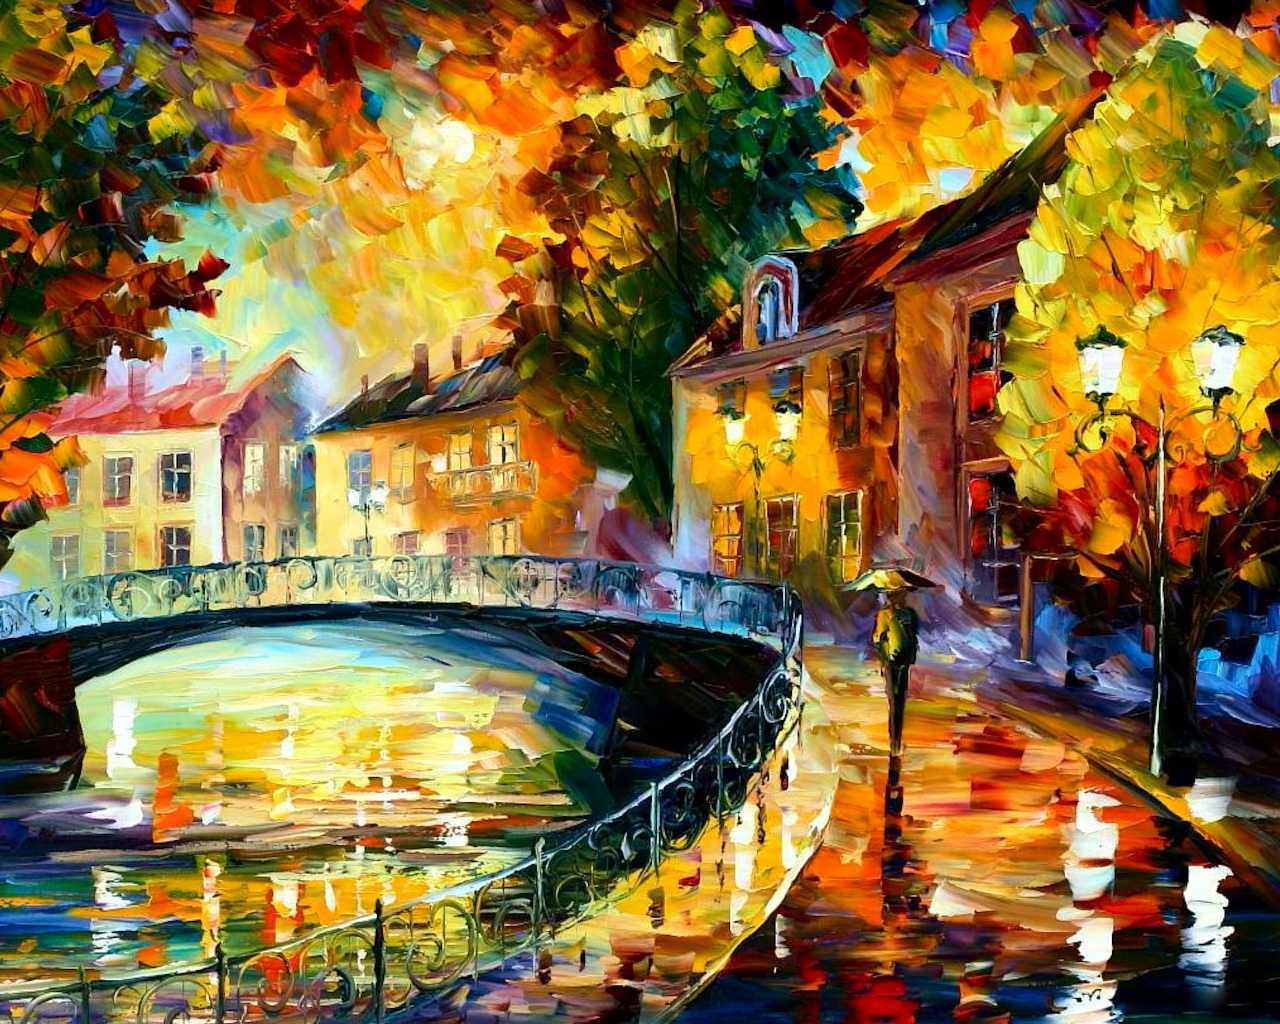 Best Wallpaper Base: Best Painting Wallpaper #2